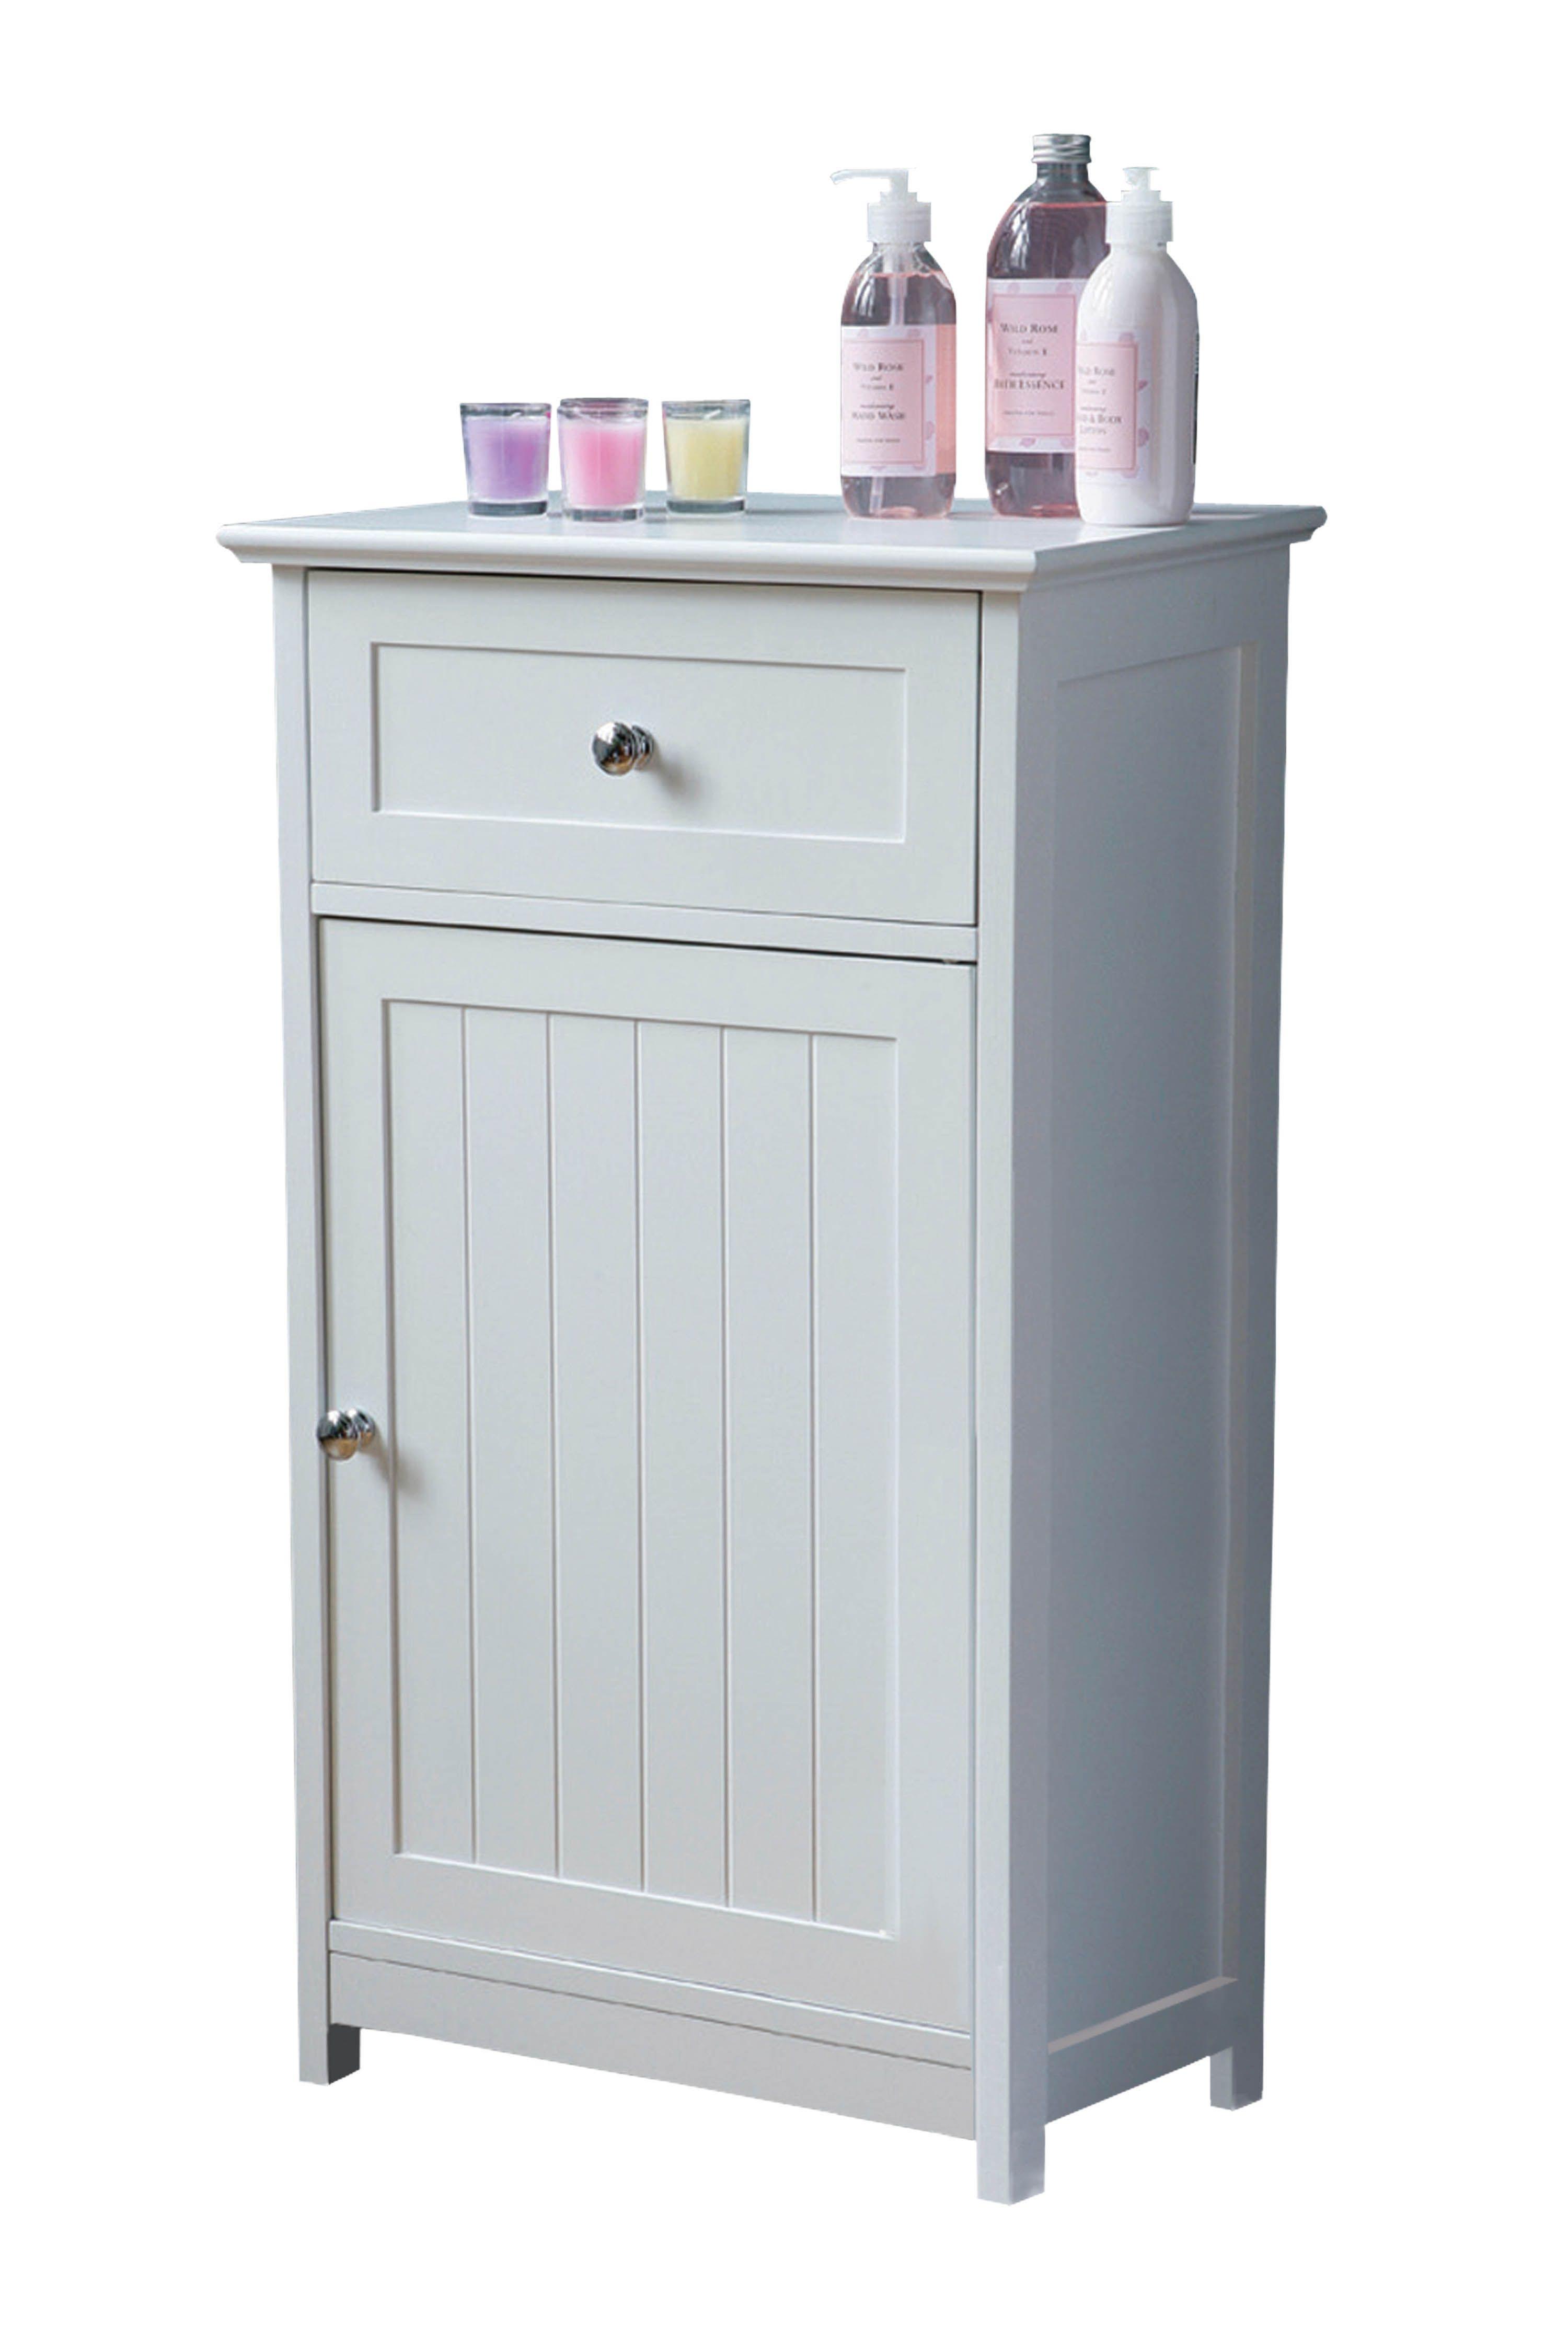 Bathroom storage drawers - Bathroom Storage Chest